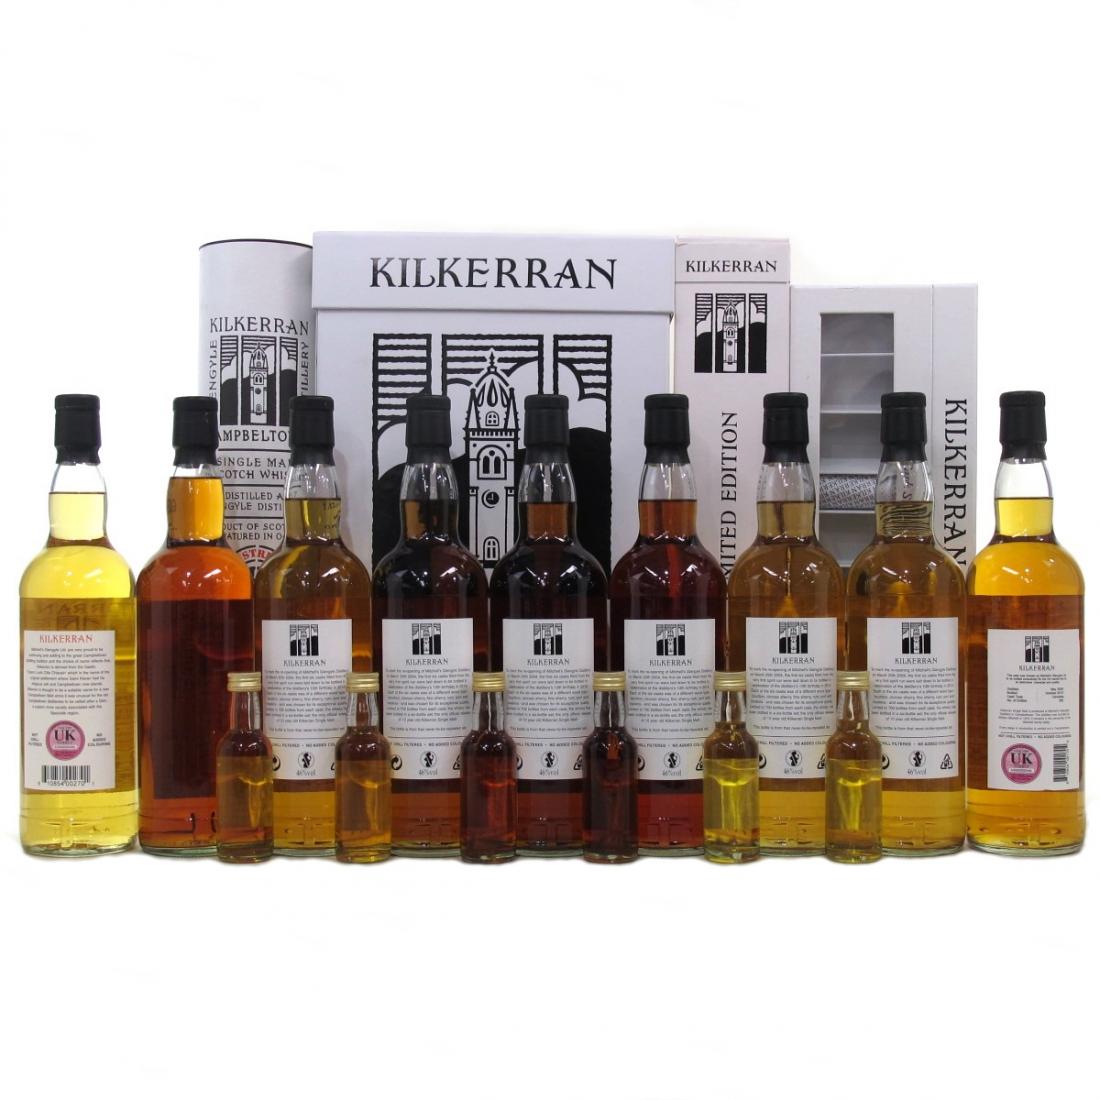 Kilkerran Selection 9 x 70cl / including 10th Anniversary Set & Miniatures 5cl x 6